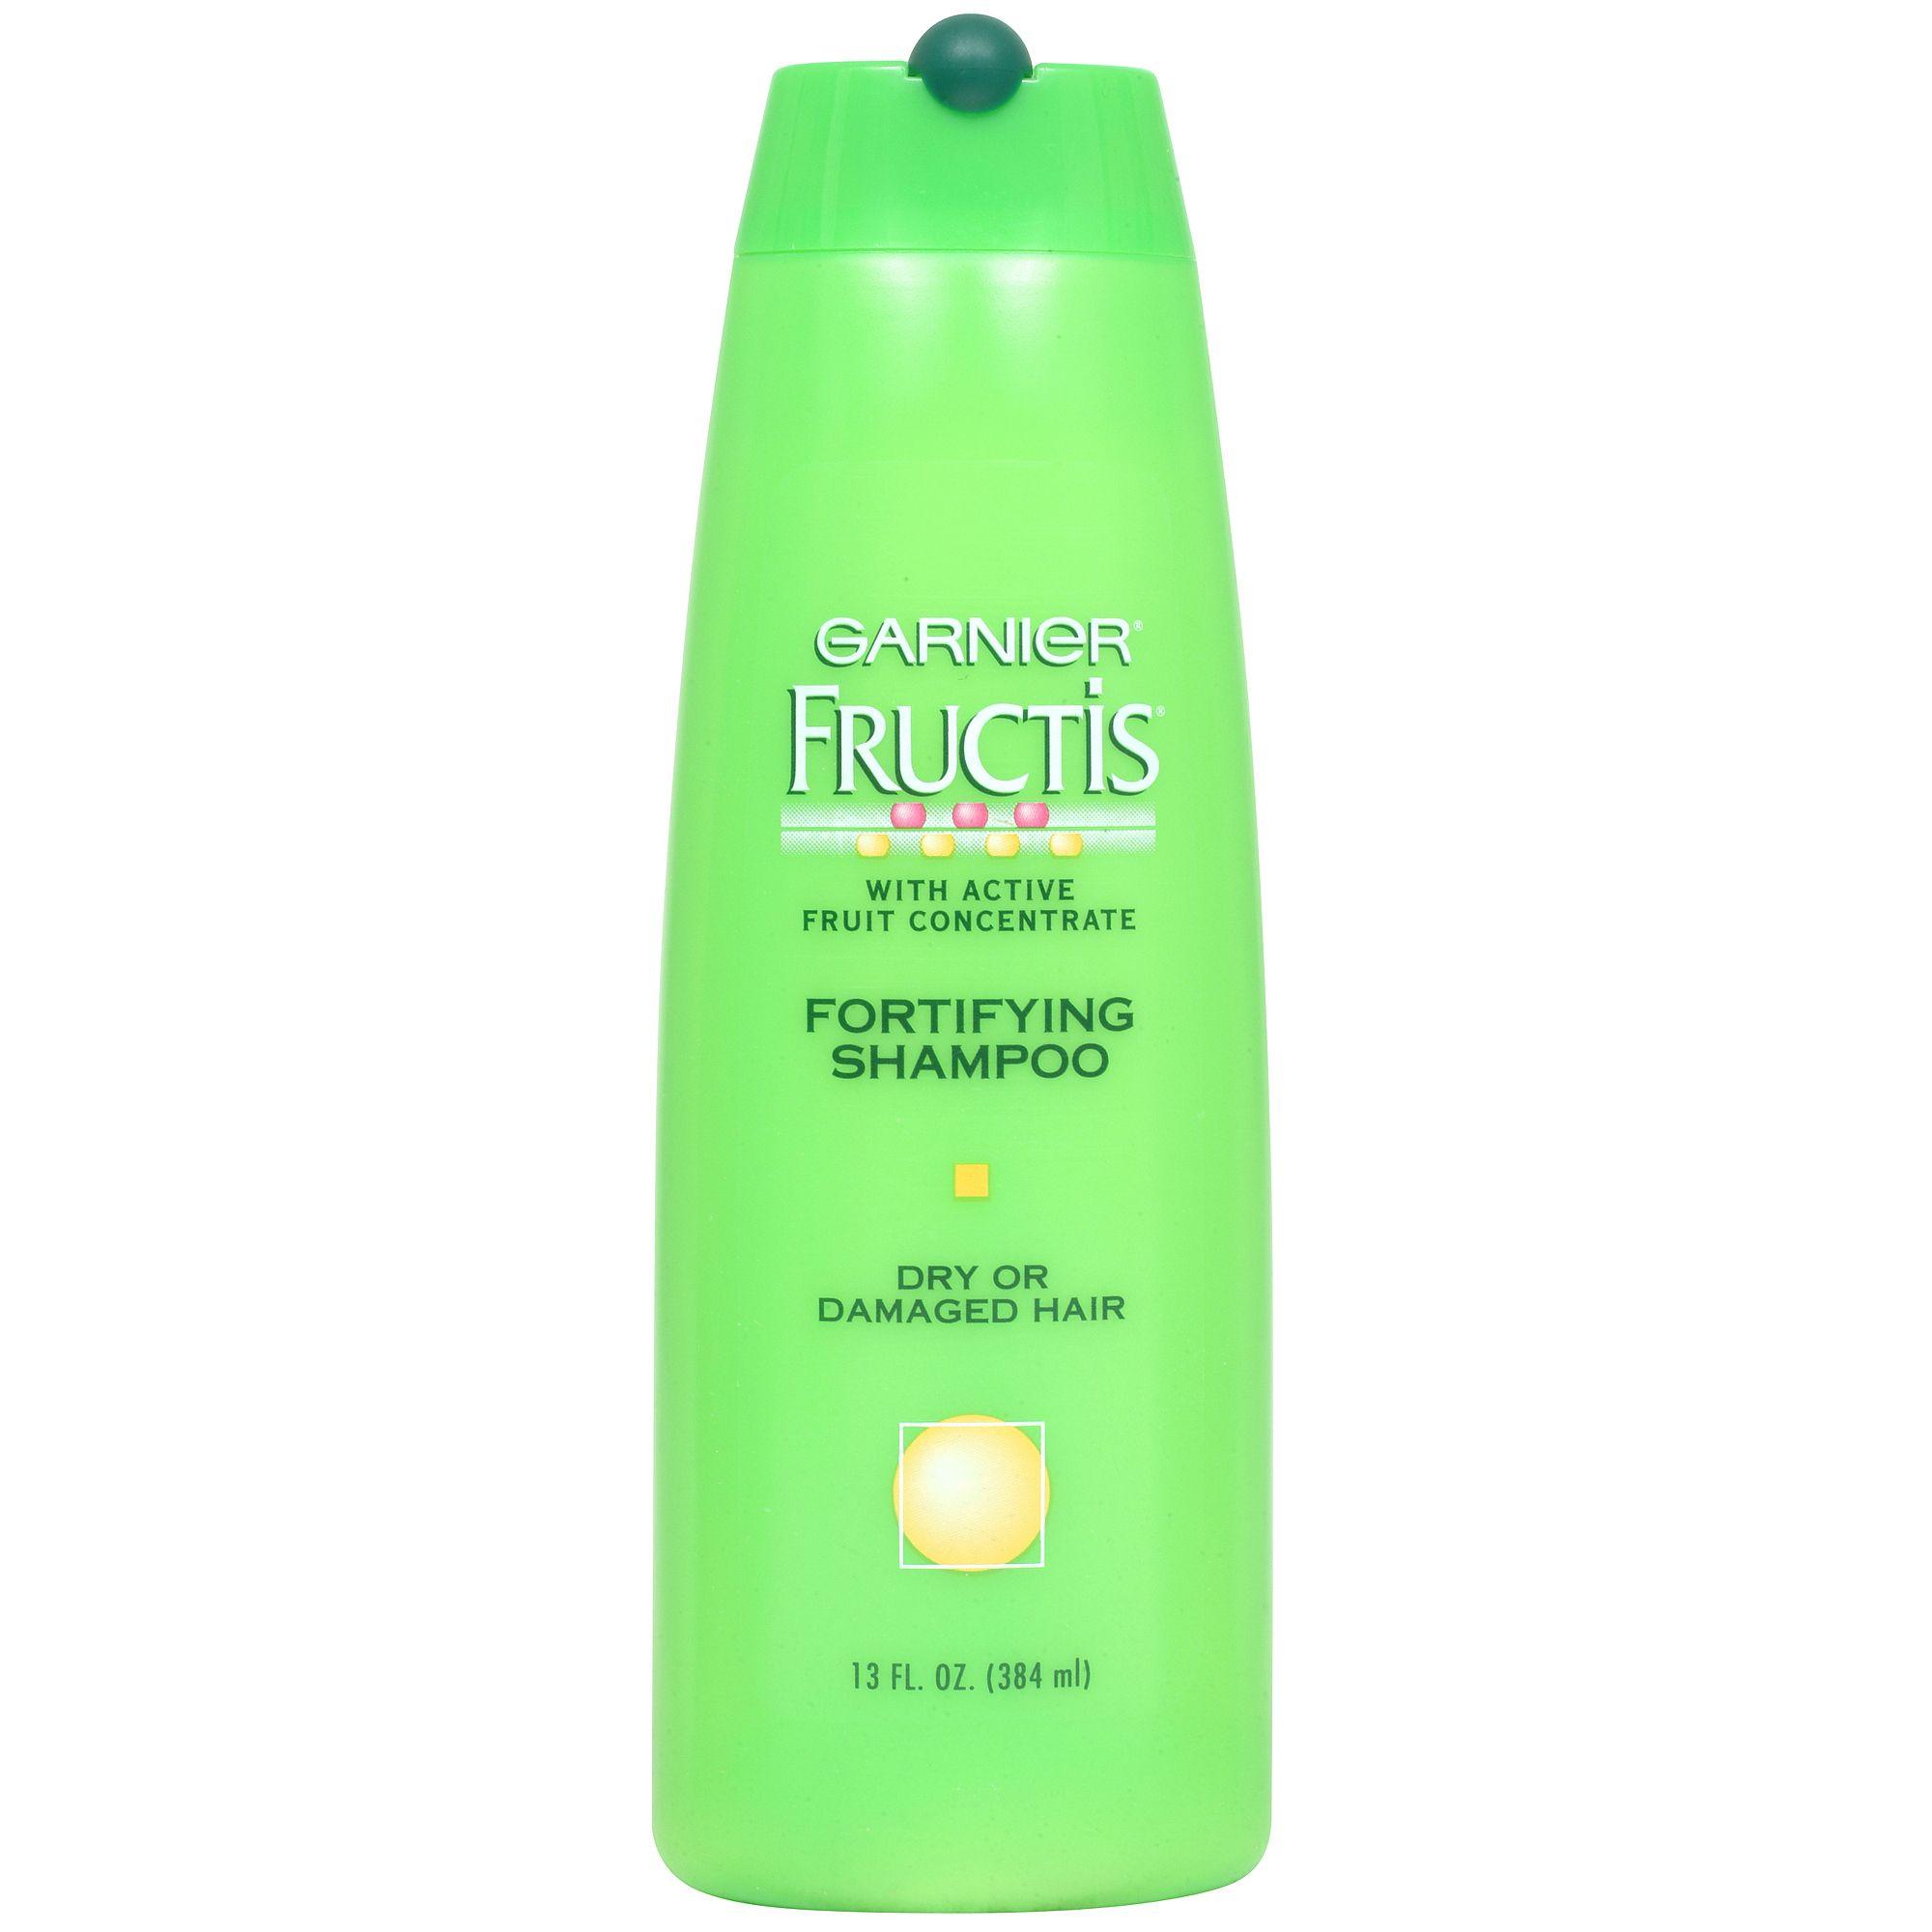 Garnier Fructis Fortifying Shampoo For Normal Hair